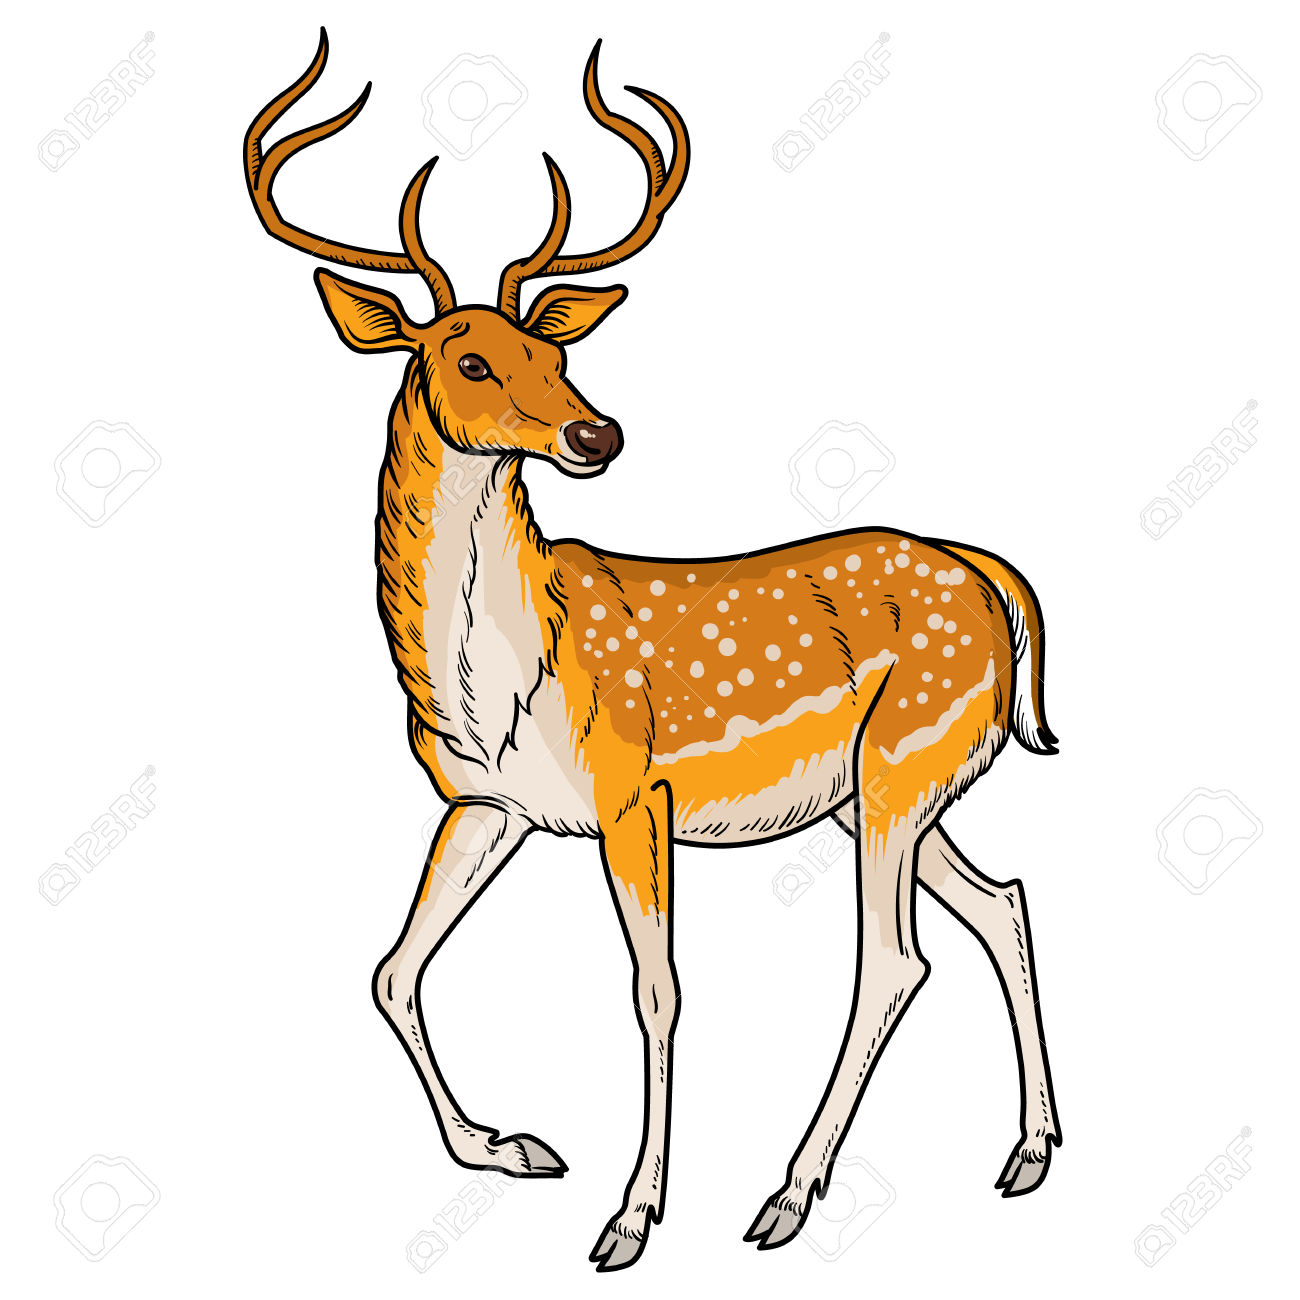 1300x1300 Deer Clipart Elegant